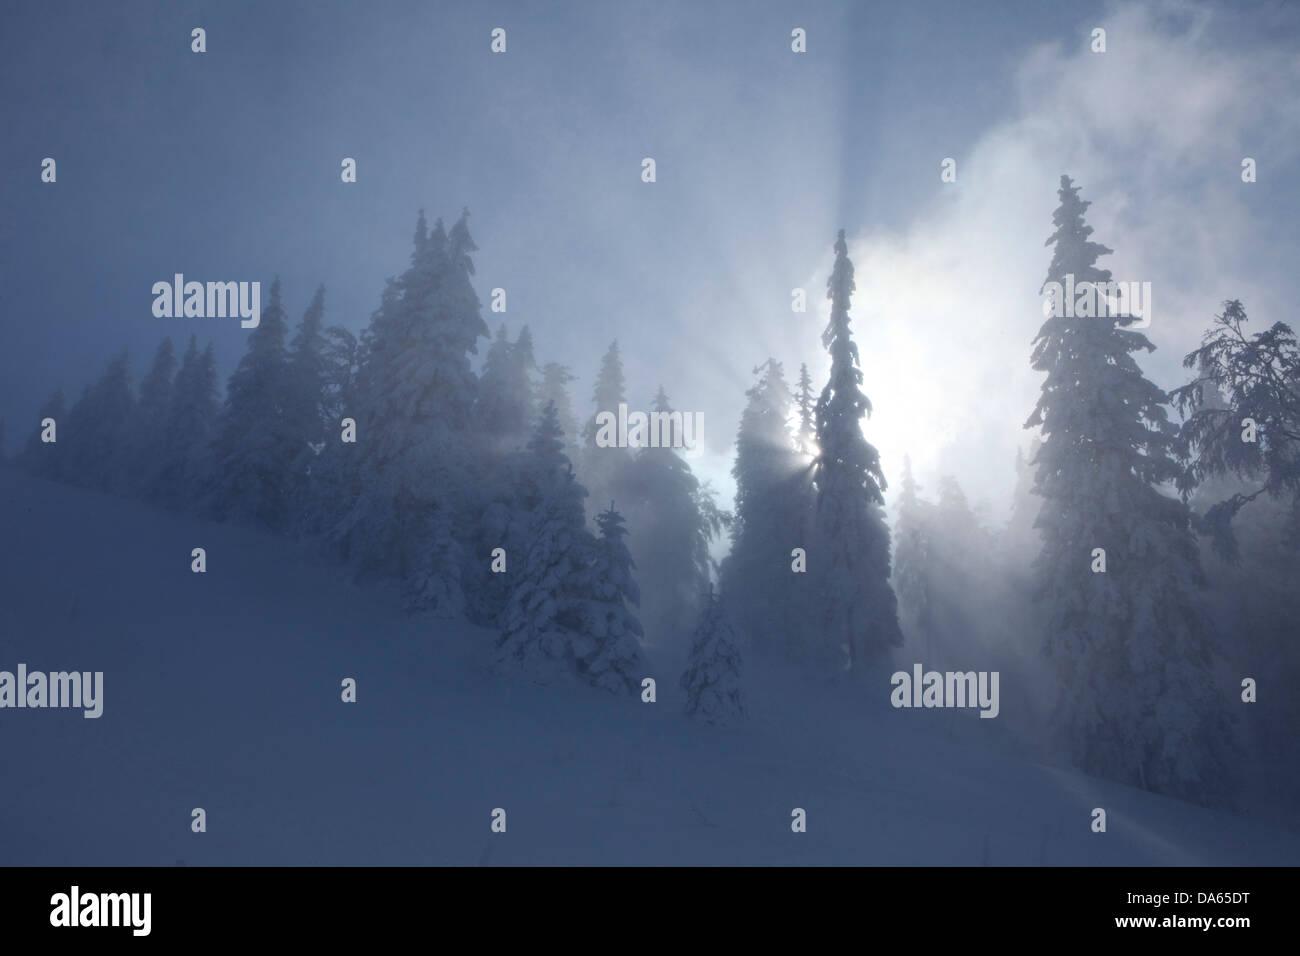 Winterbäume, Winter, Kanton, VD, Waadt, Schnee, Baum, Bäume, Holz, Wald, Schnee, Tannen, Schweiz, Europa, Stockbild